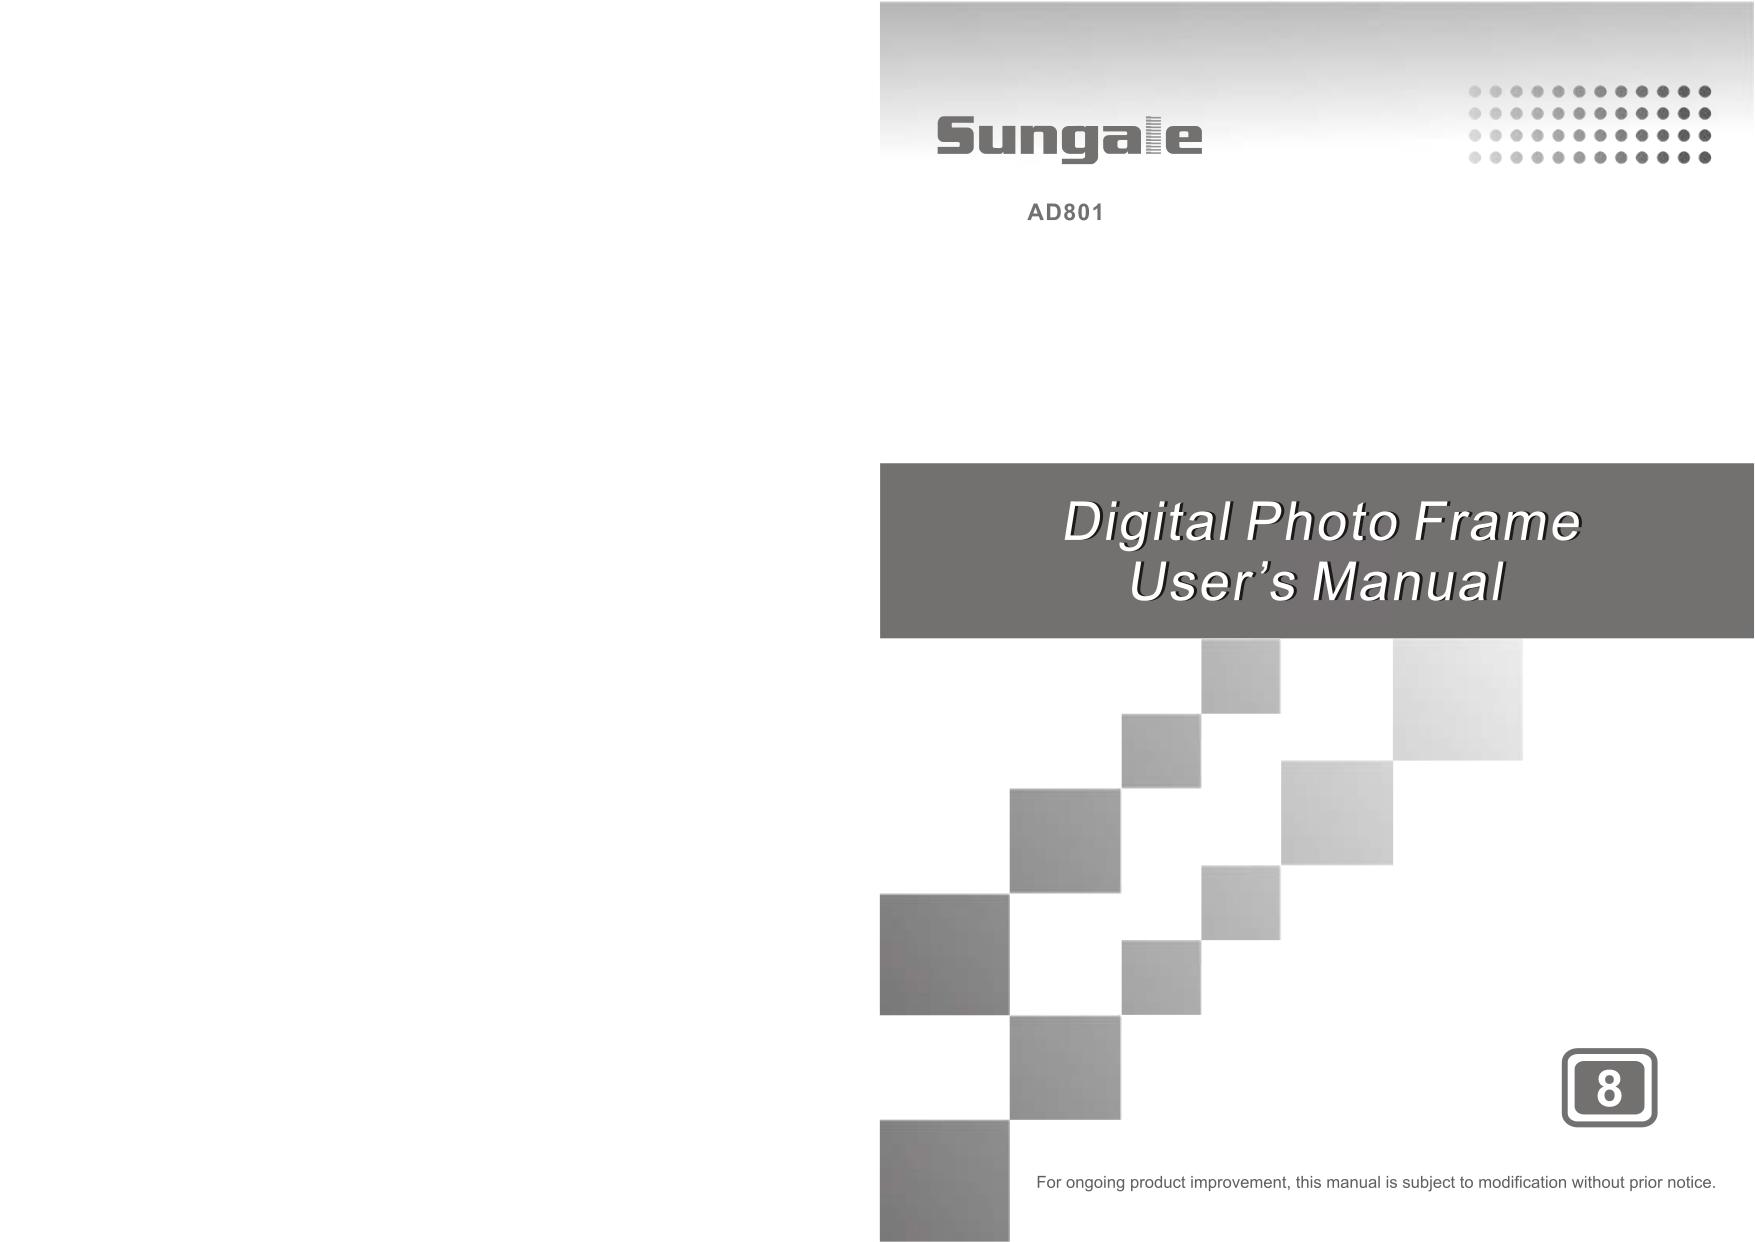 Pdf Manual For Sungale Digital Photo Frame Ad801